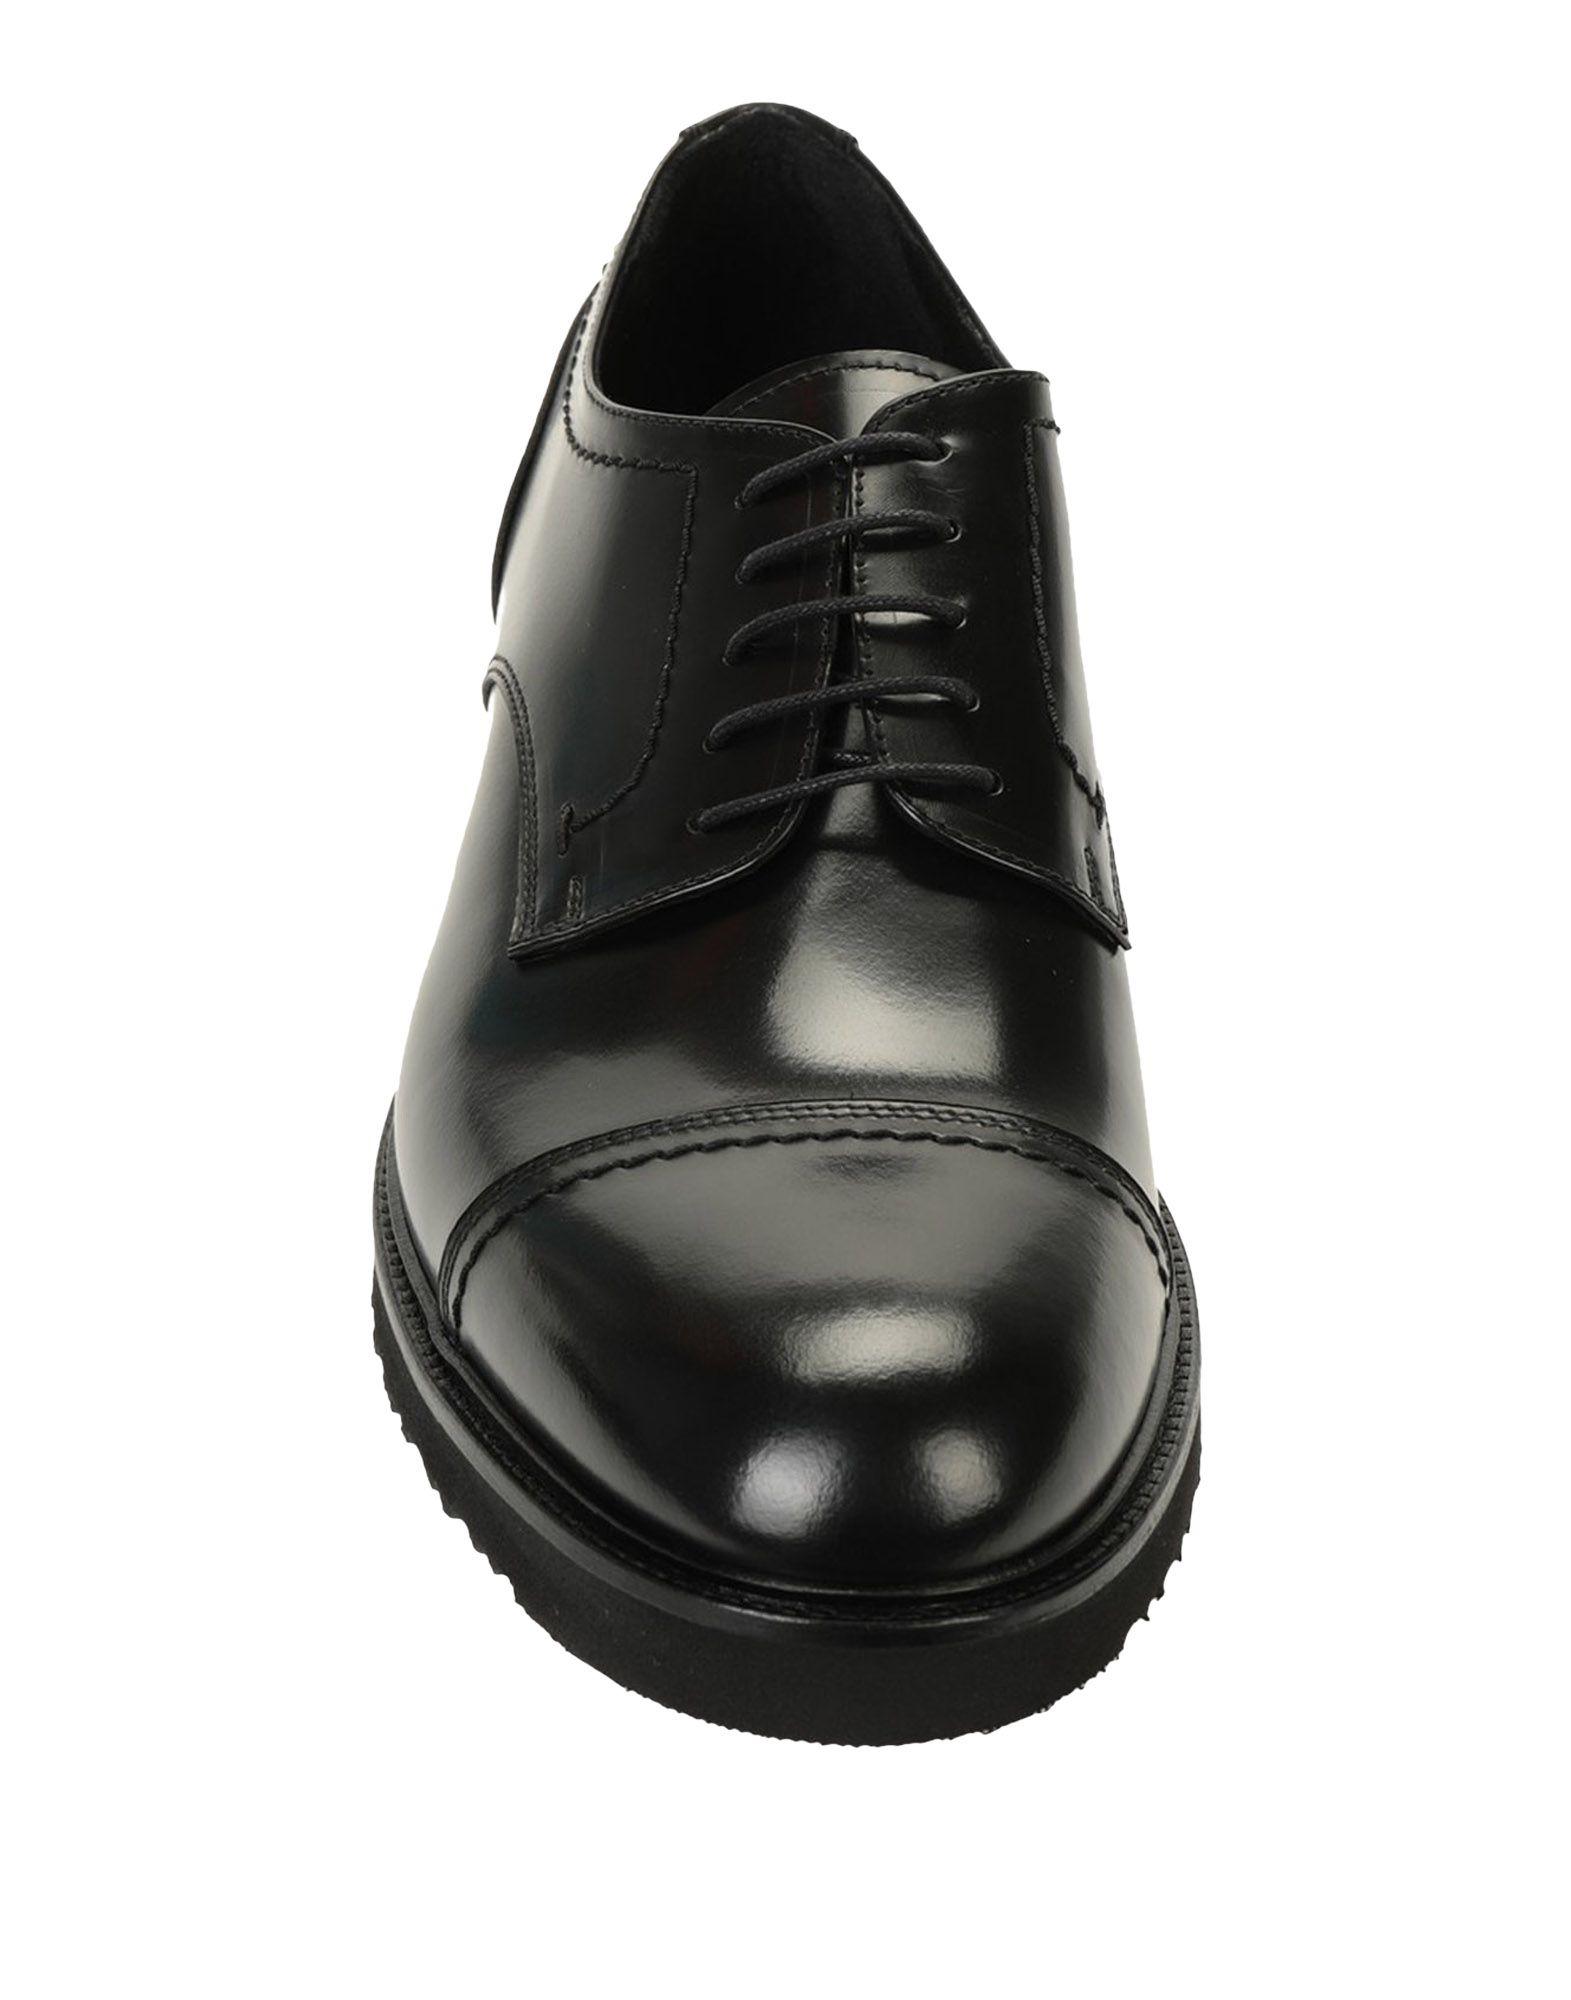 Maldini Schnürschuhe Herren  11540384MX Gute Qualität beliebte Schuhe Schuhe beliebte 9027b8